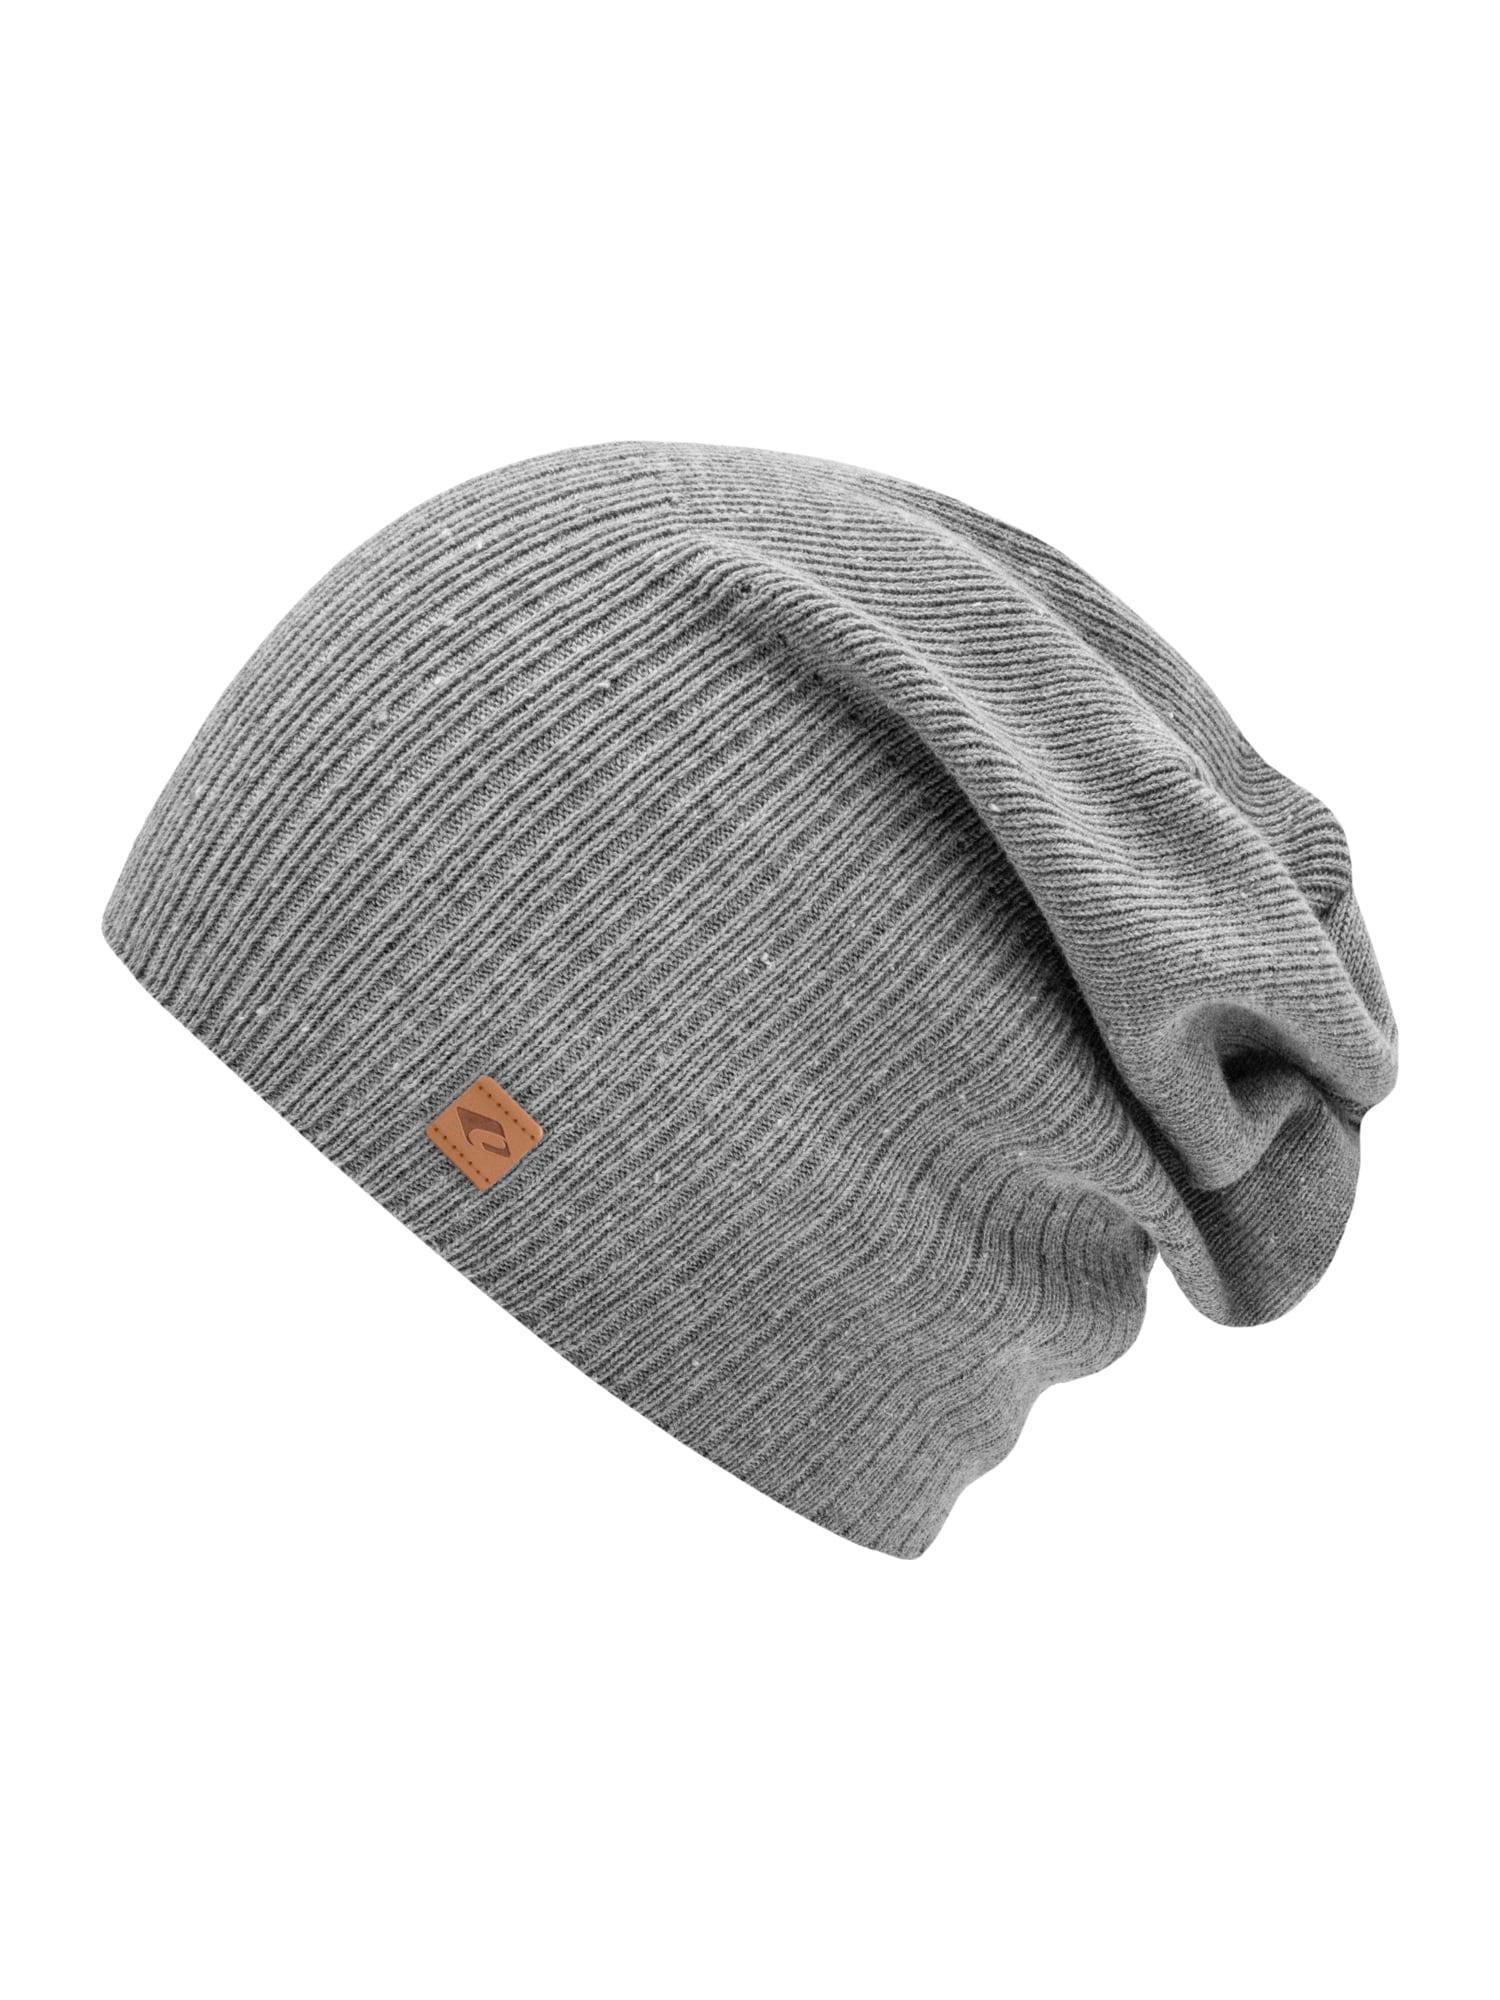 chillouts Megzta kepurė 'Lowell' šviesiai pilka